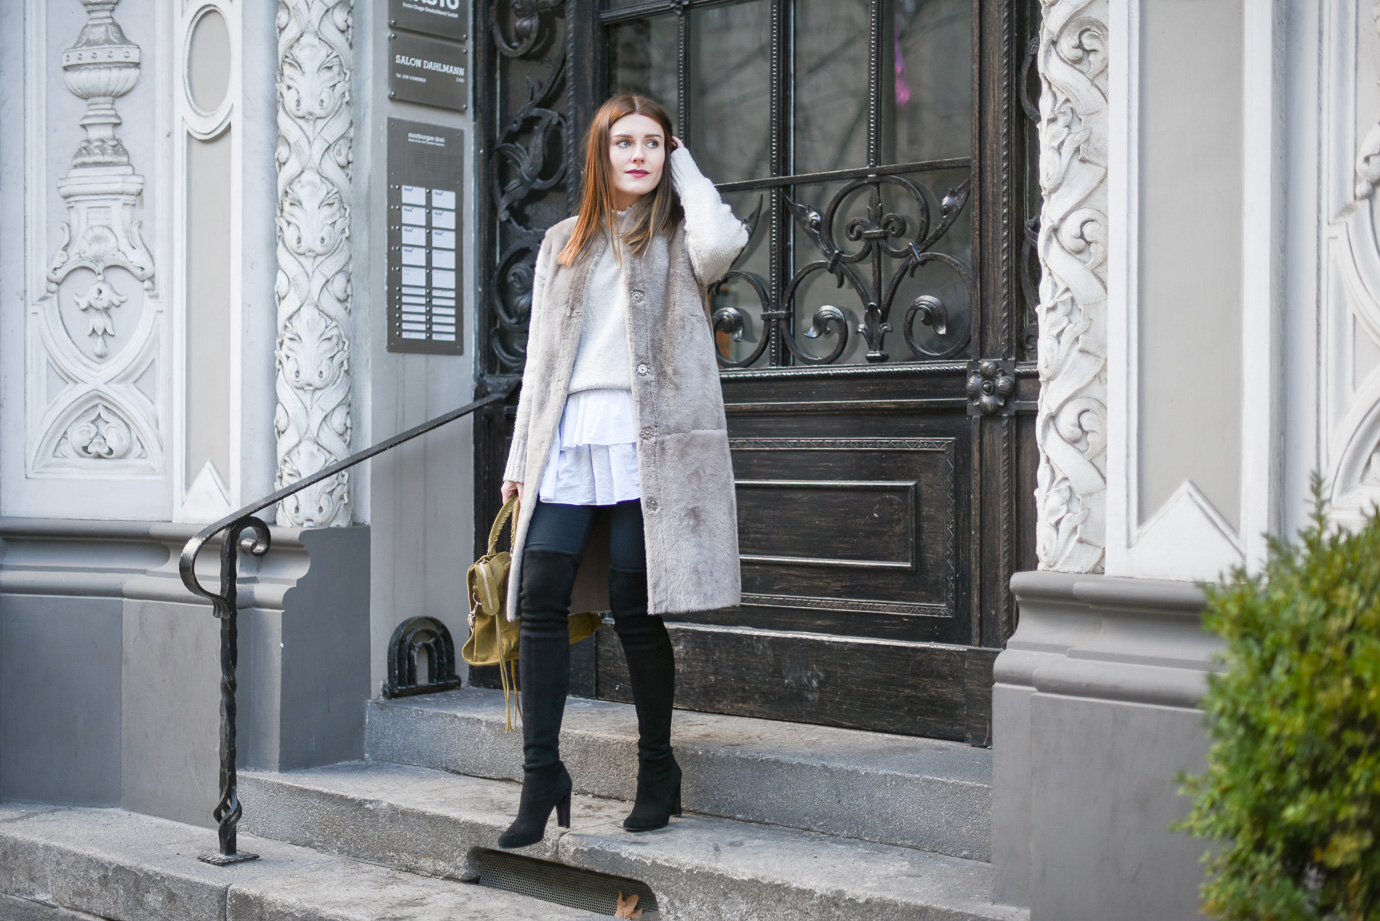 Berlin_Fashion_Week_Outfit_3